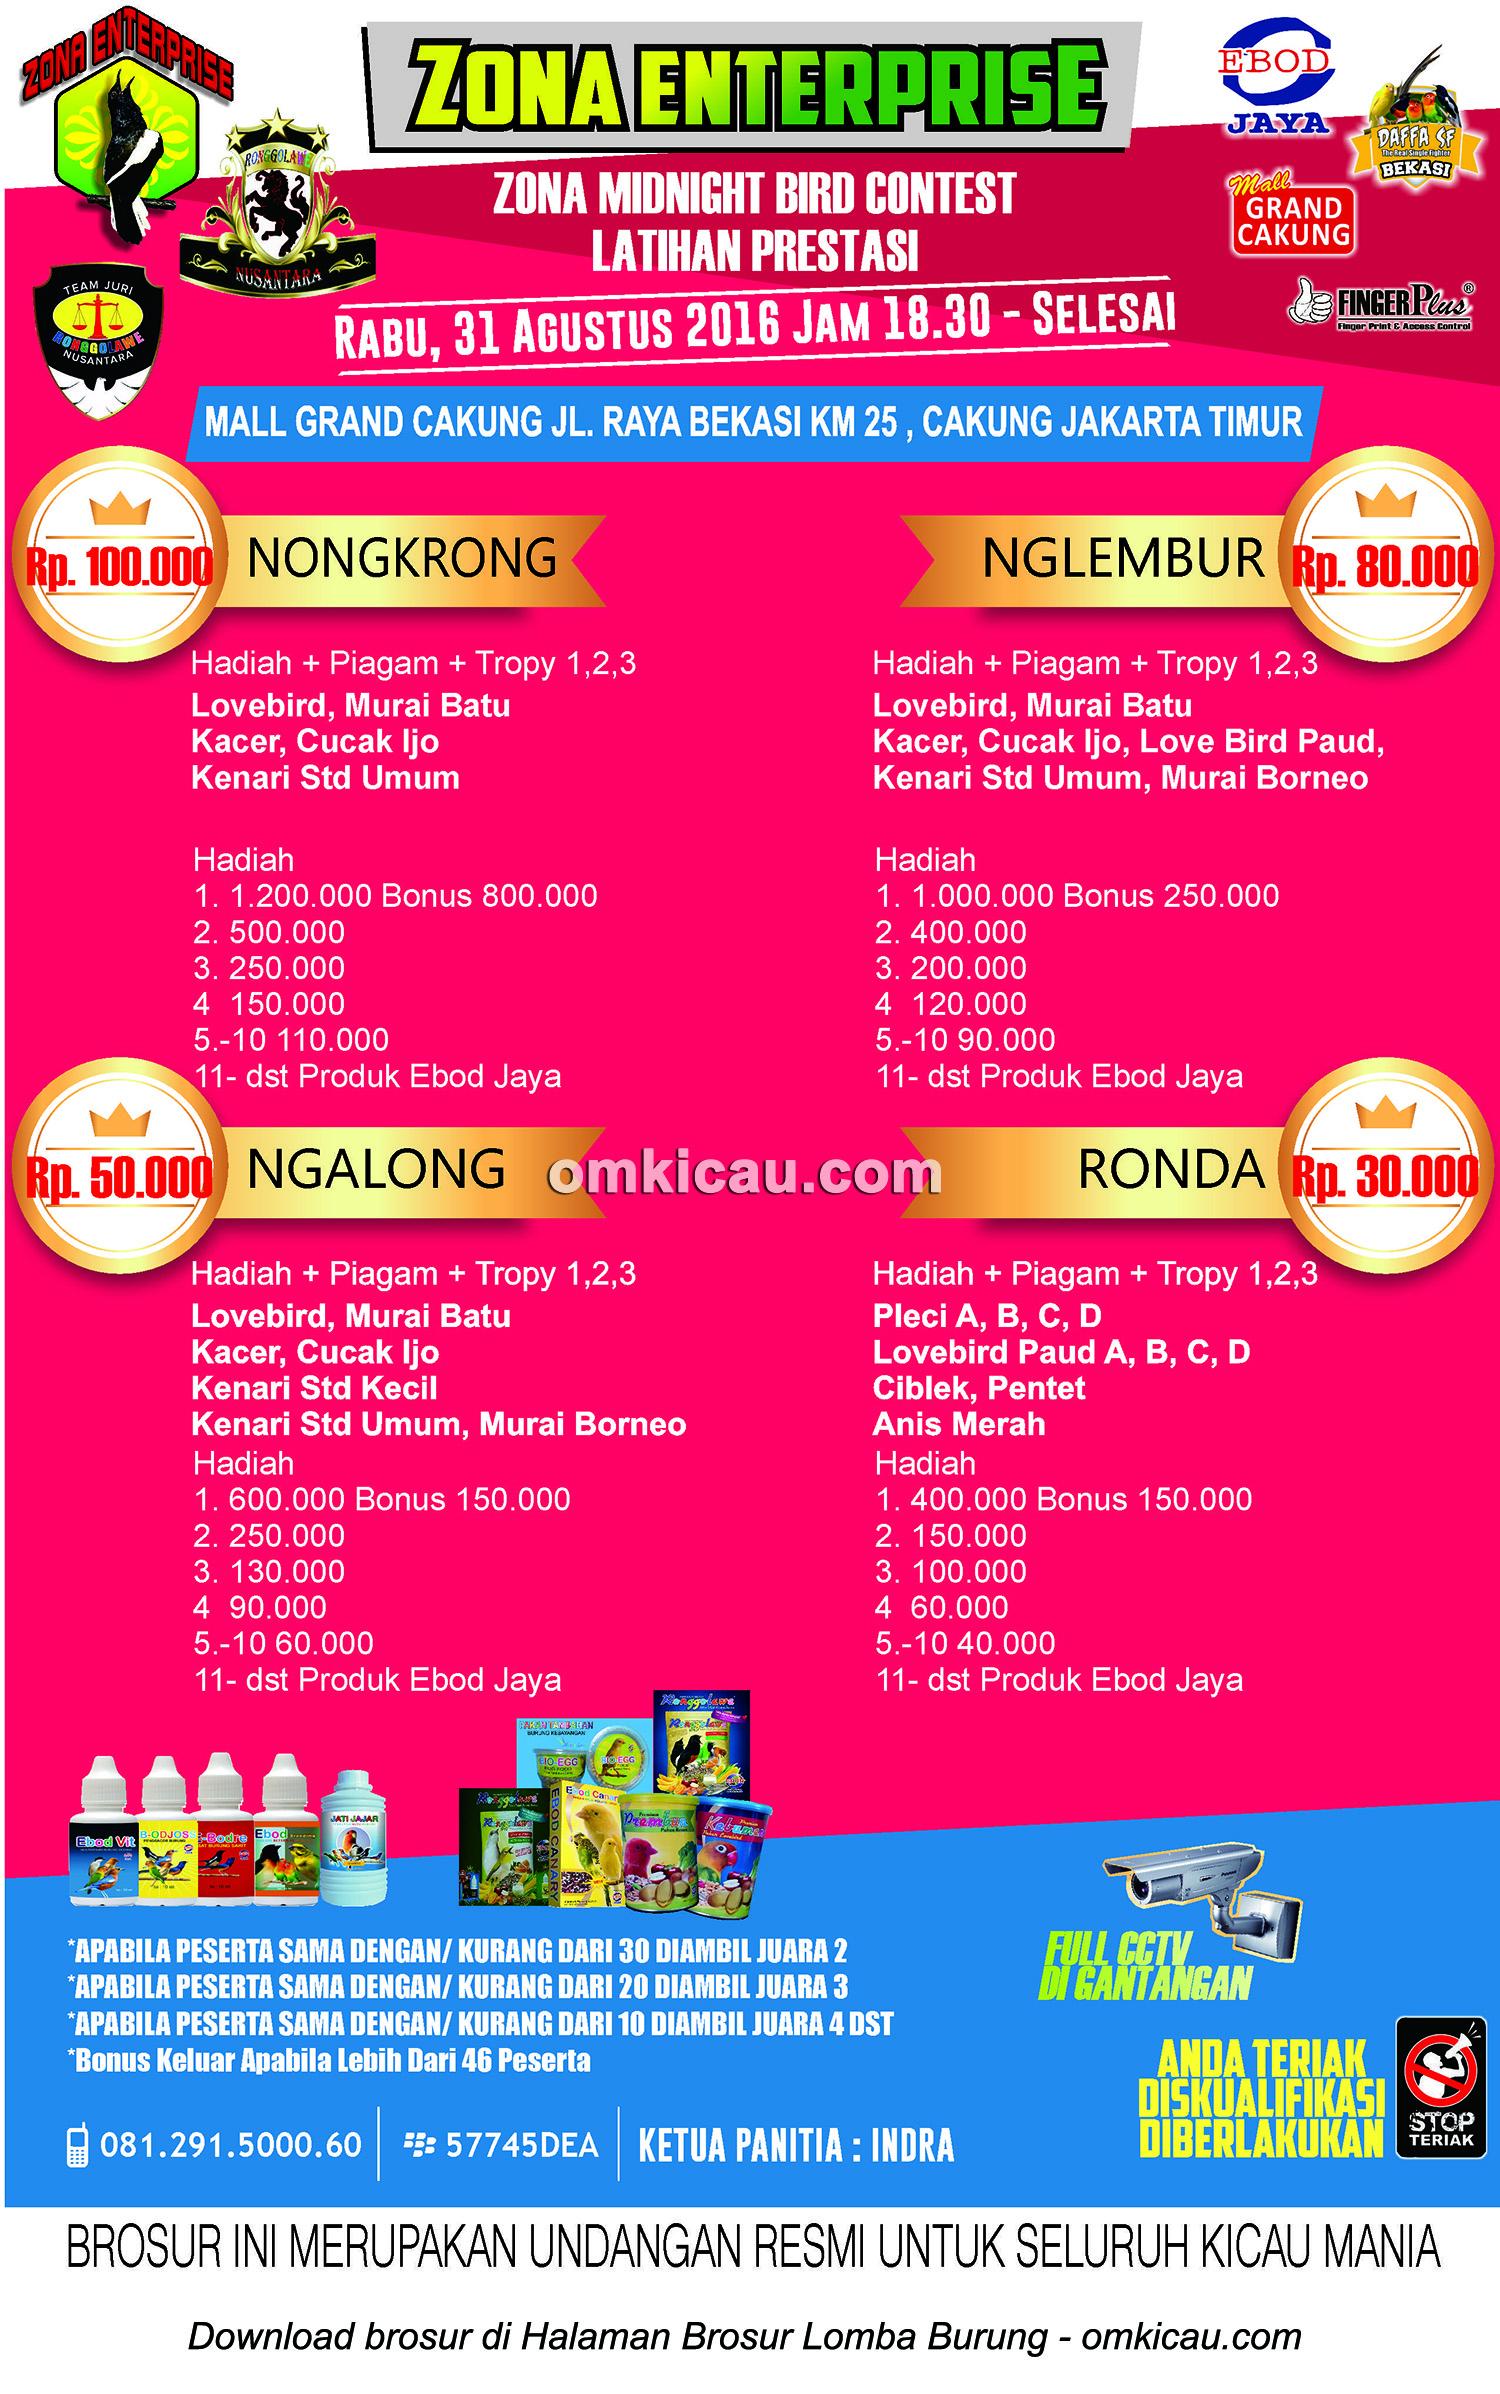 Brosur Latpres Zona Midnight Bird Contest, Jakarta Timu, 31 Agustus 2016